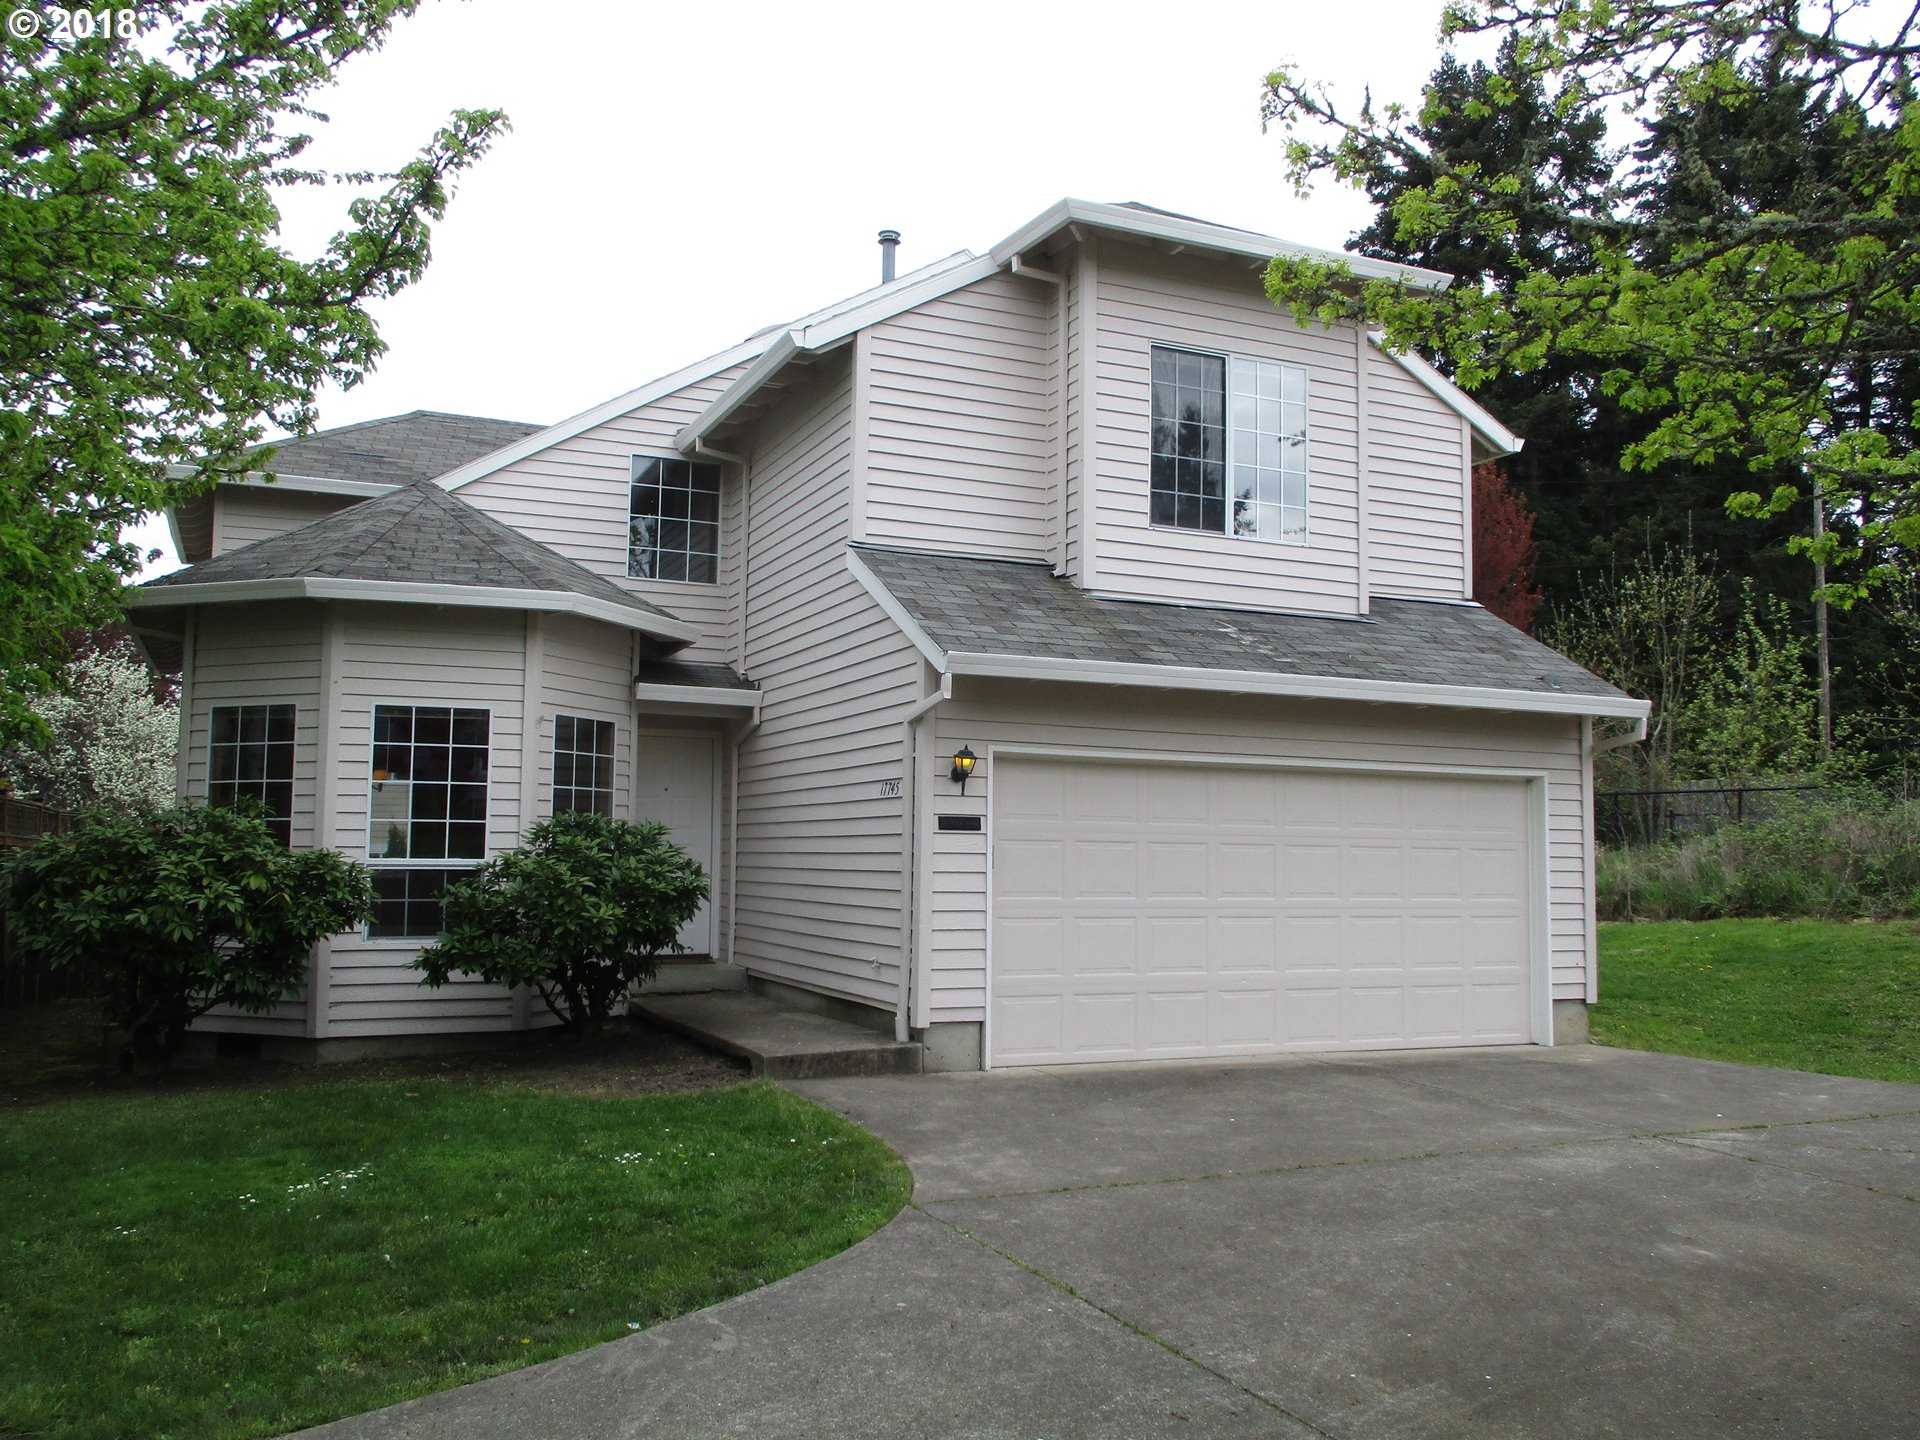 $389,950 - 4Br/3Ba -  for Sale in Beaverton